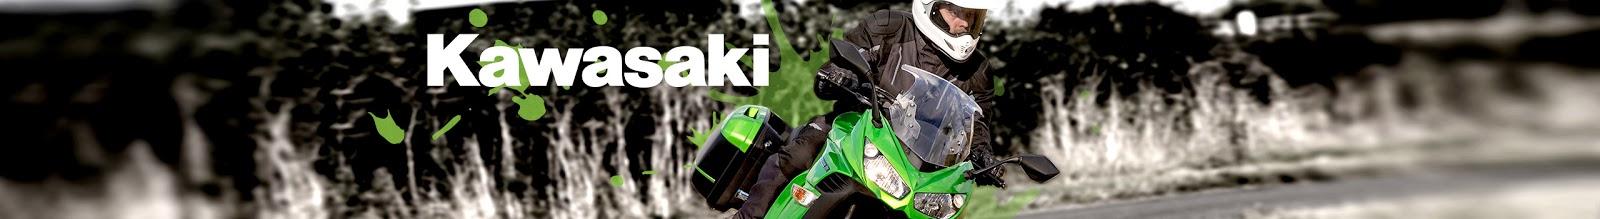 Lowongan Kerja PT Kawasaki Motor Indonesia Wilayah Pulogadung dan Cibitung MM2100